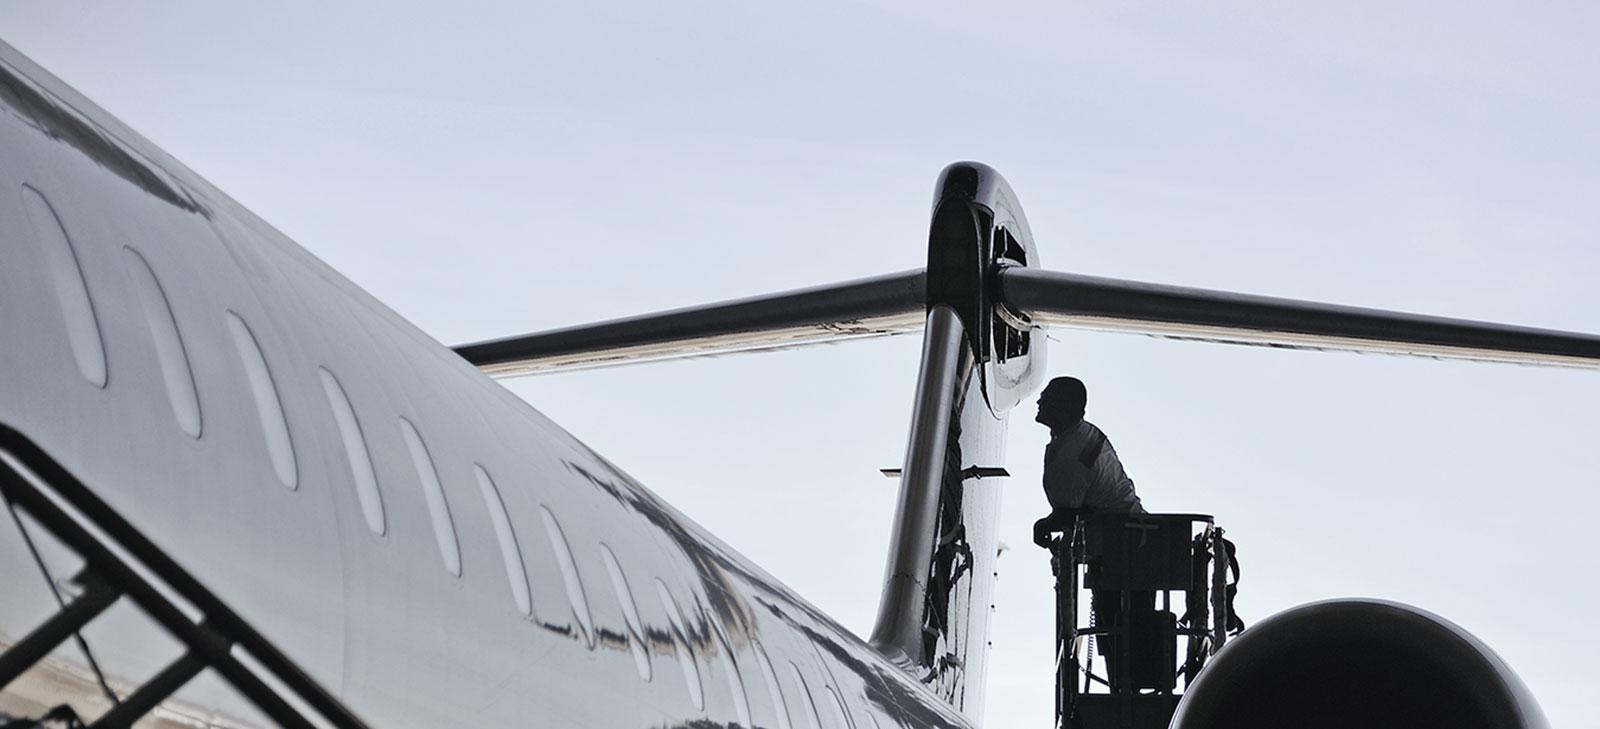 Your Customer Services - Regional Aircraft |CRJ Series MHIRJ